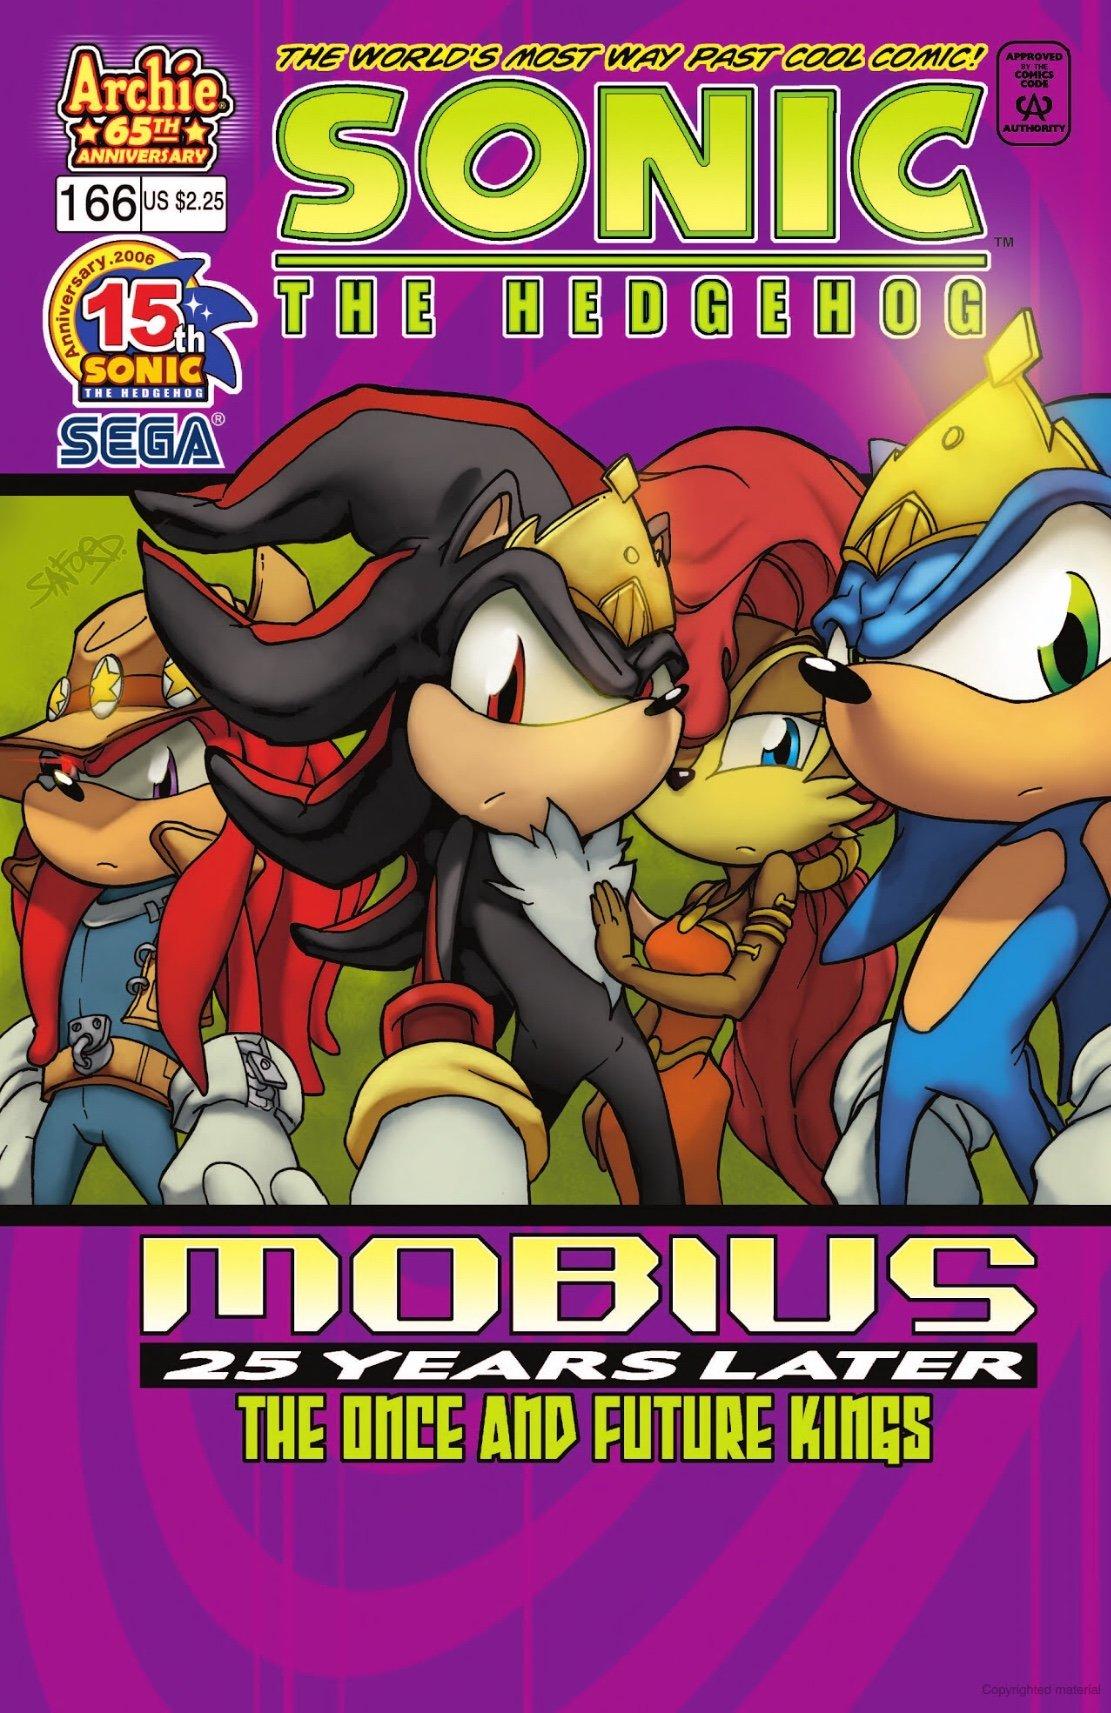 Sonic the Hedgehog 166 (November 2006)